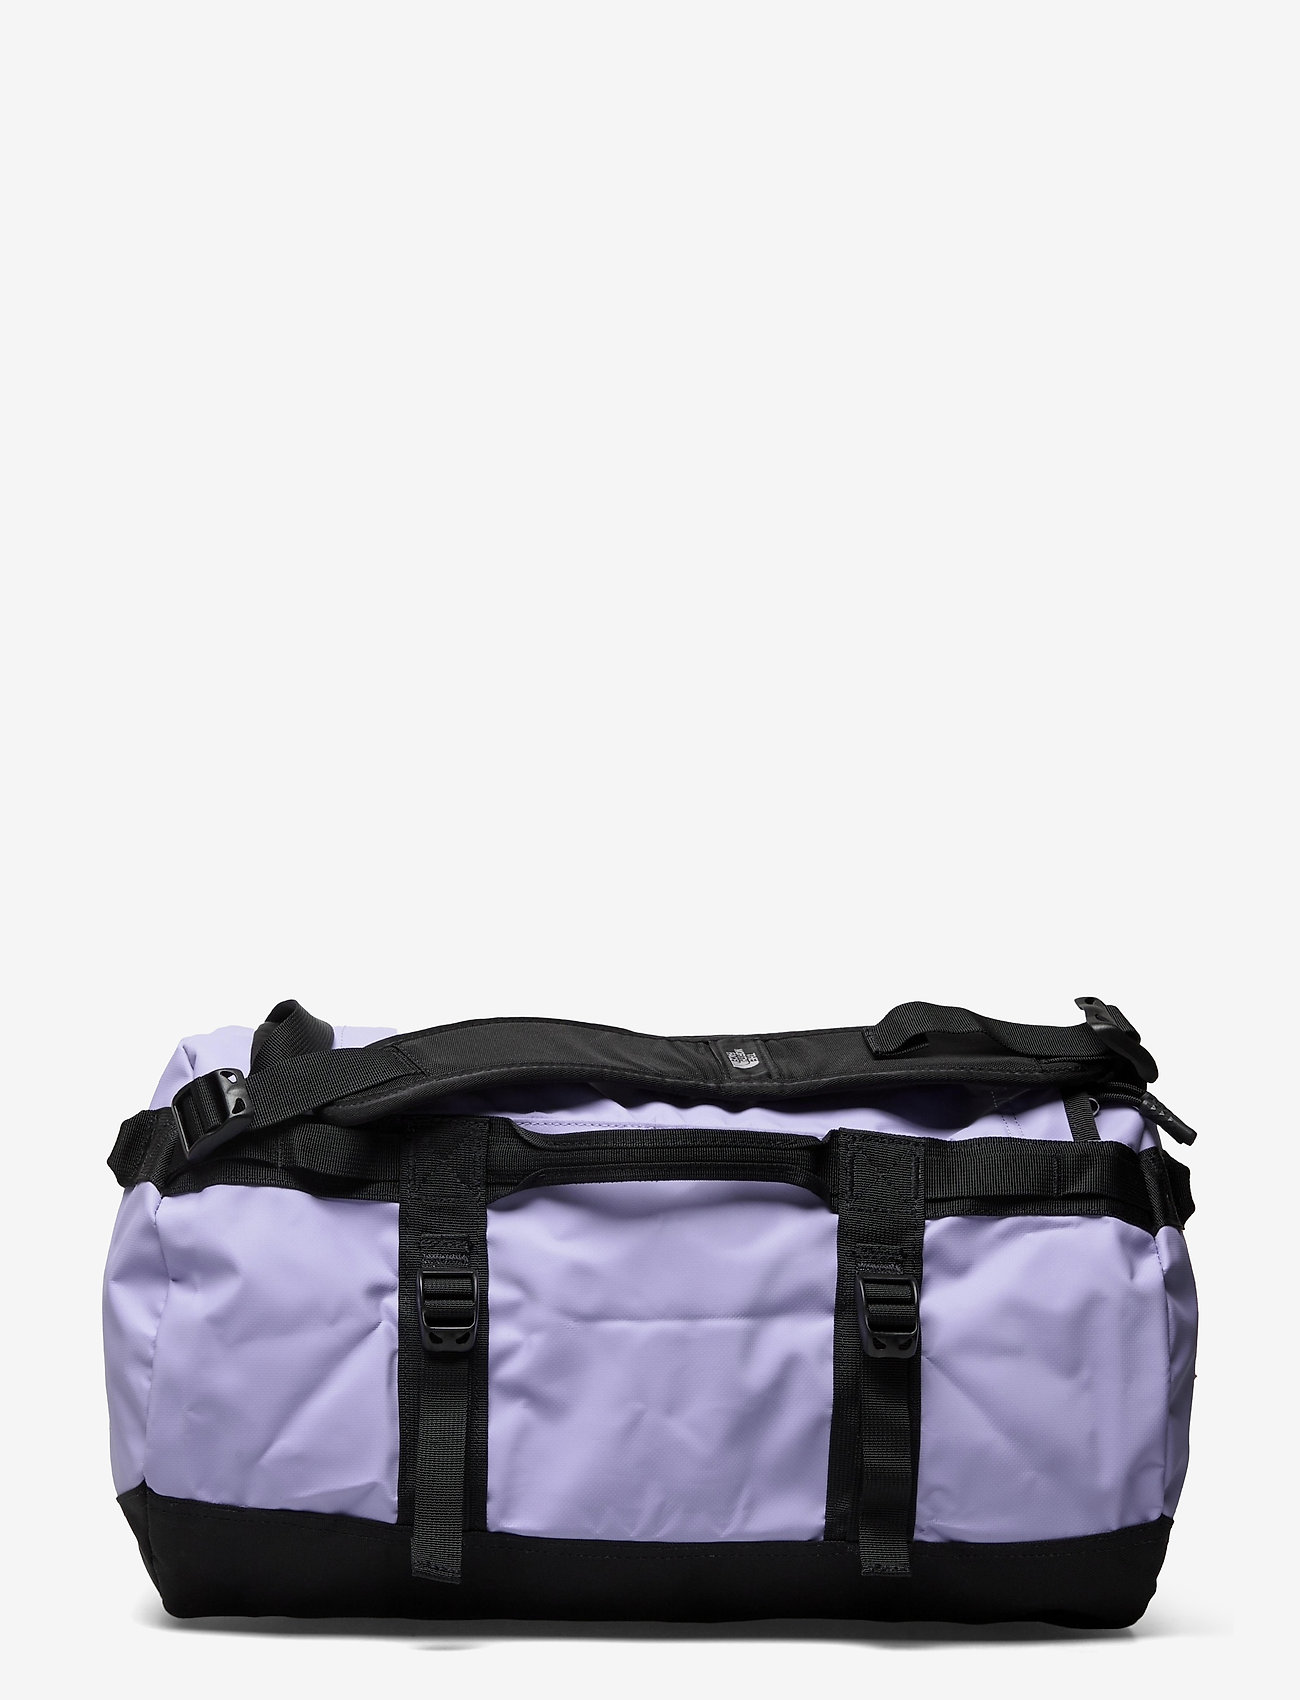 The North Face - BASE CAMP DUFFEL - XS - sacs de sport - sweet lavender-tnf black - 1